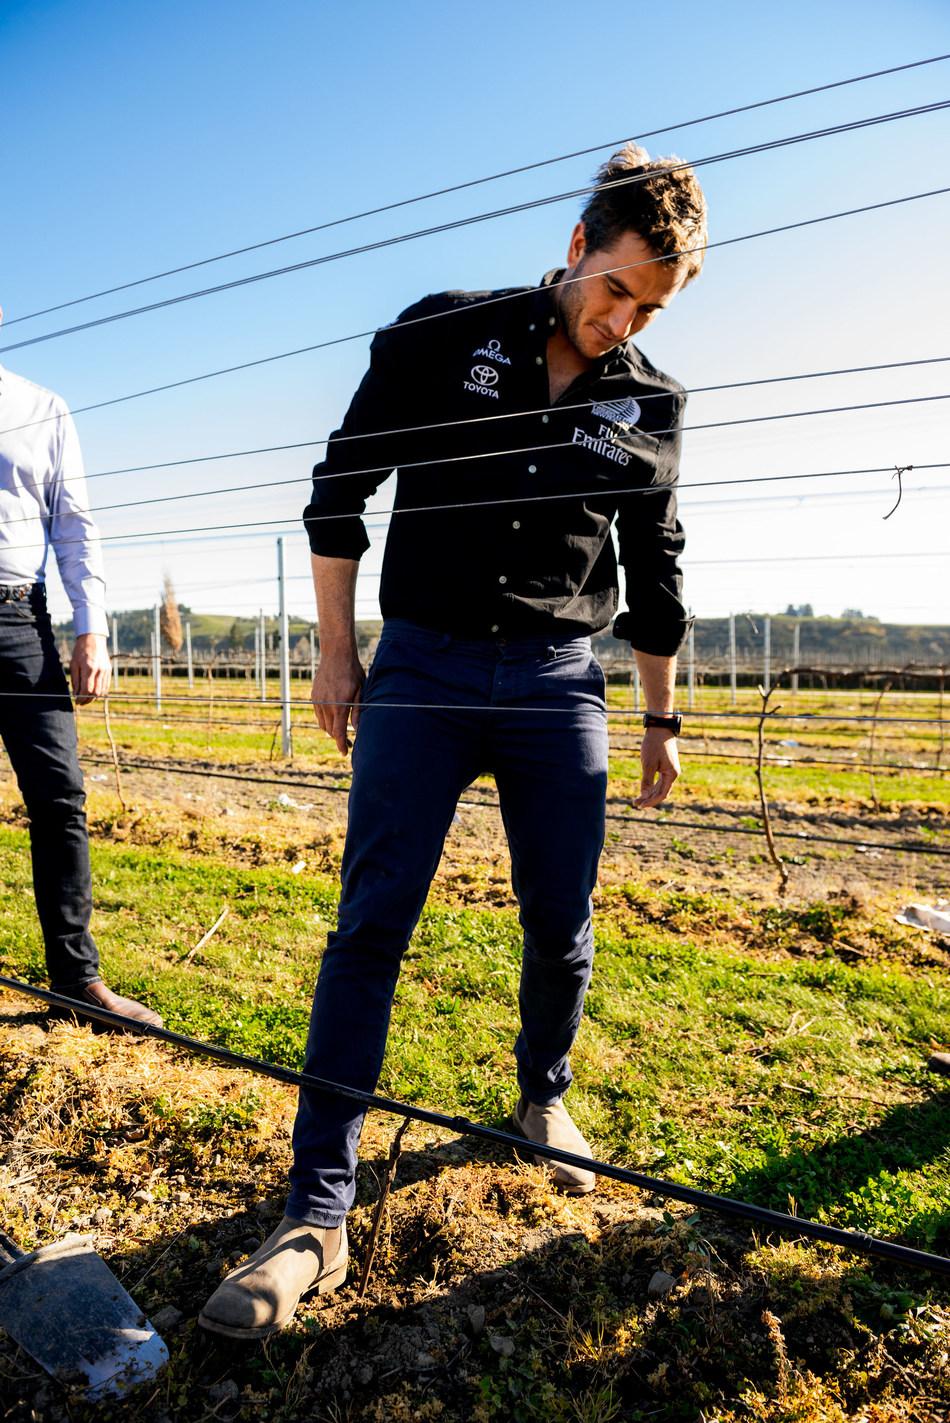 Blair Tuke from Emirates Team New Zealand plants a vine on Brancott Vineyard